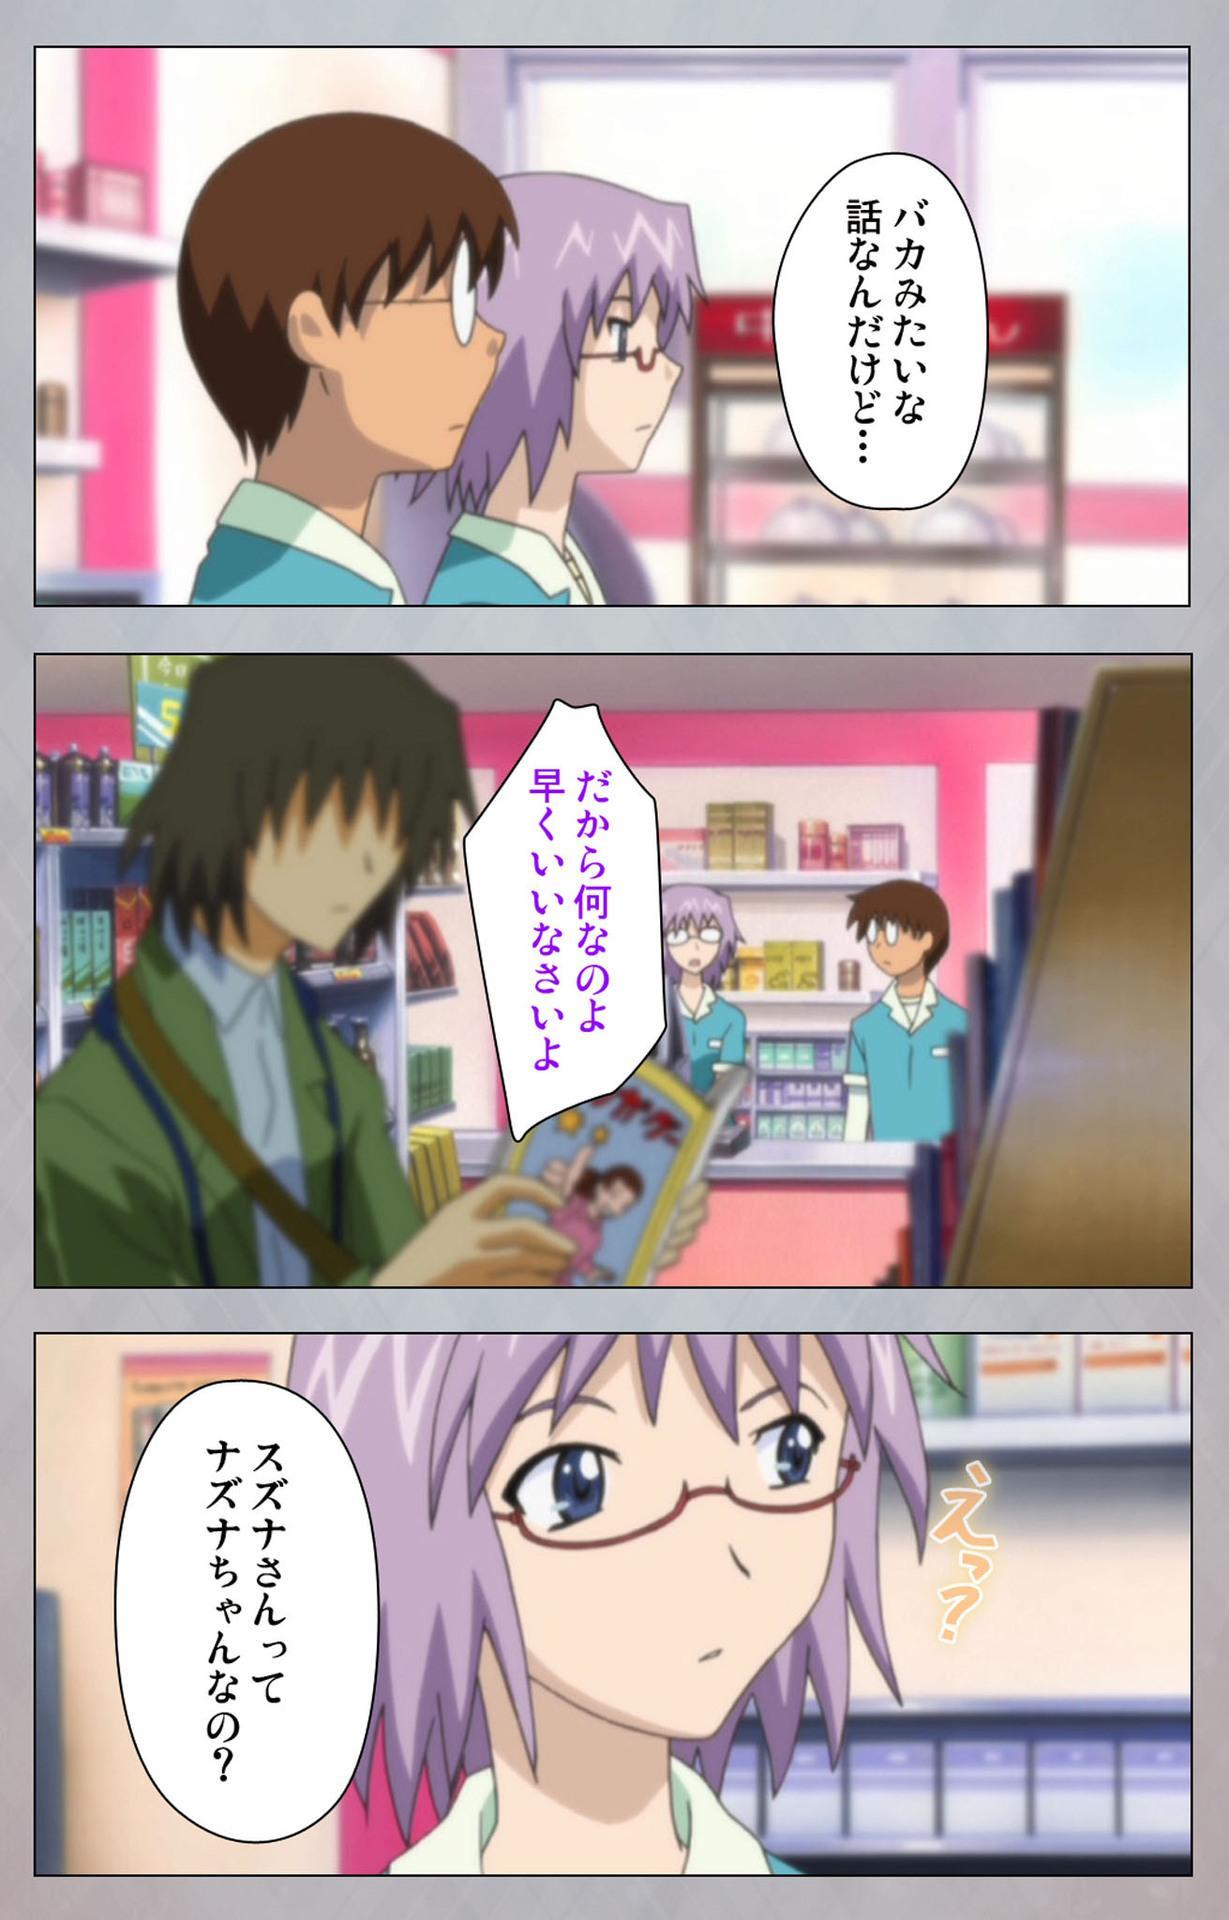 [Digital Works] [Full Color Seijin Ban] Sex Android ~Risou no Onna de Nuite yaru~ Kanzenban 117